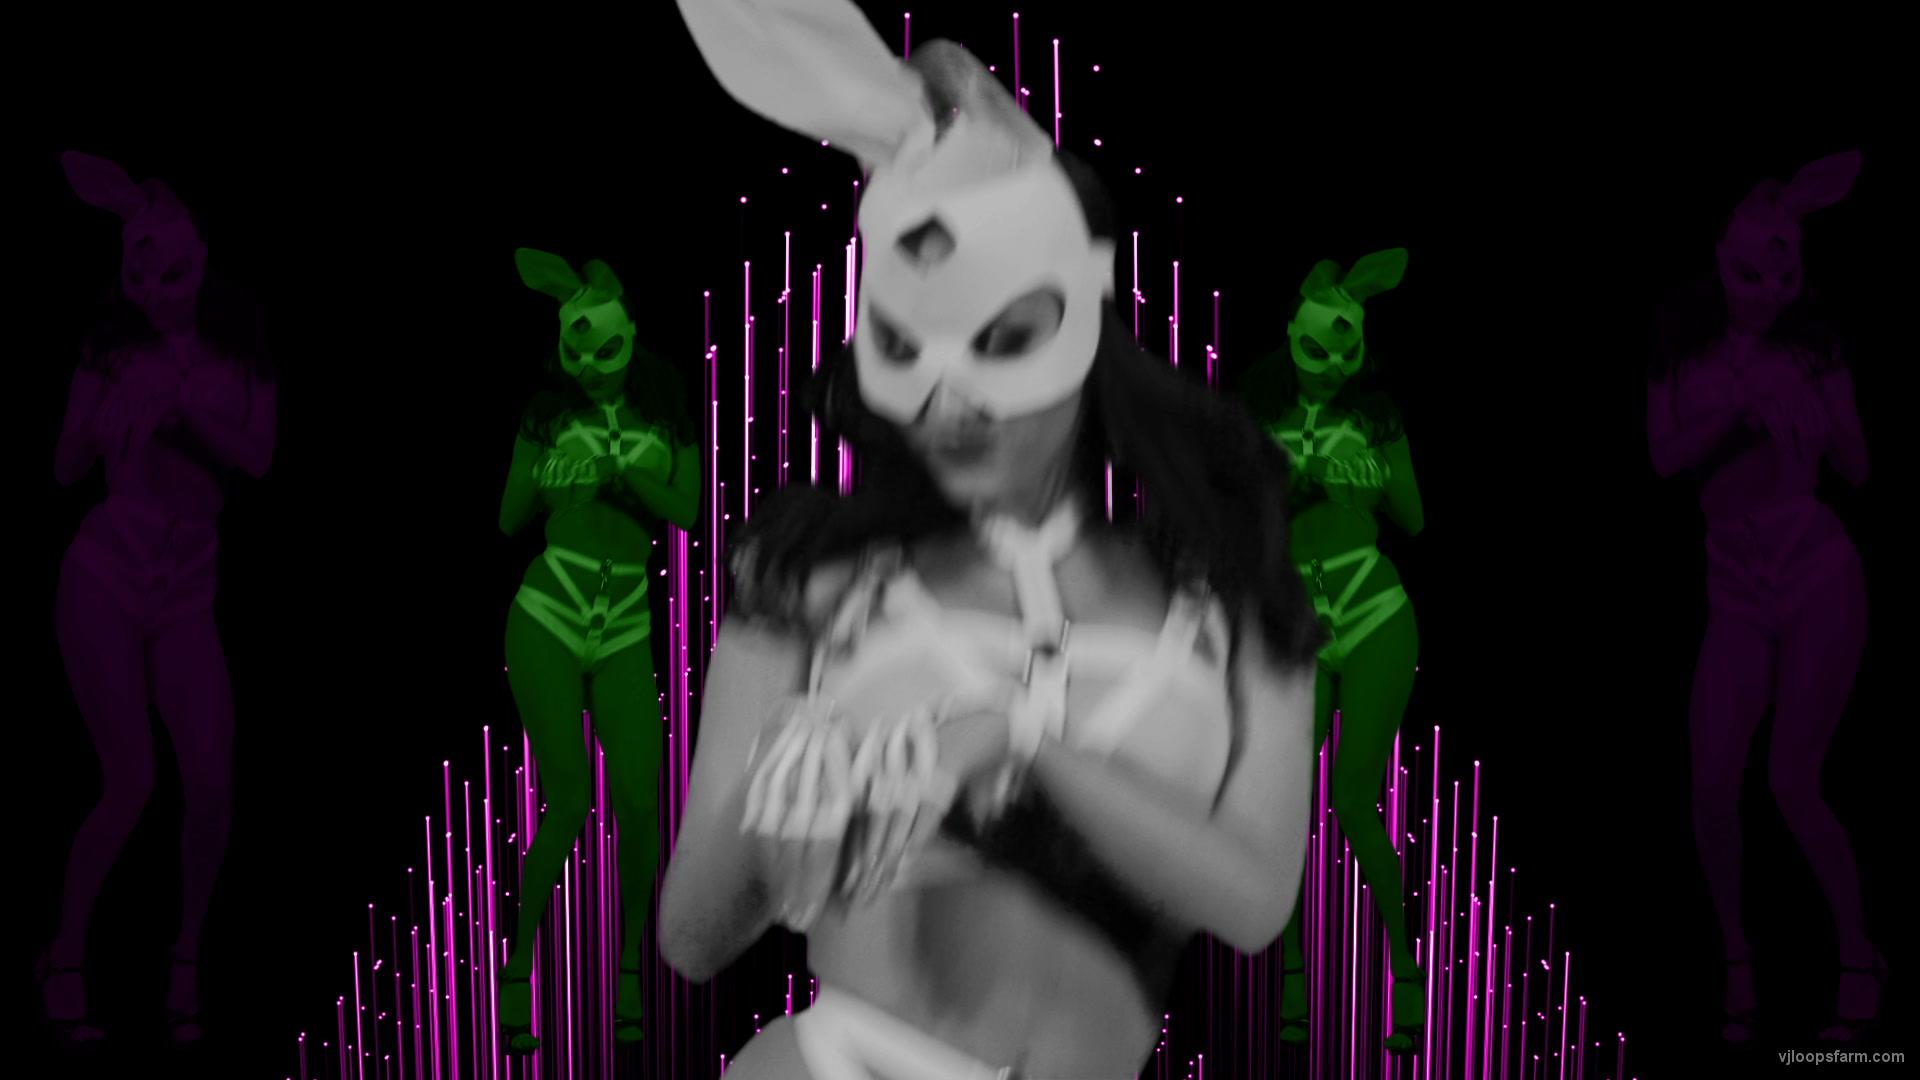 vj video background Multi-Rabbit-costumed-cute-woman-dancing-in-strobing-background-LIMEART-VJ-Loop_003